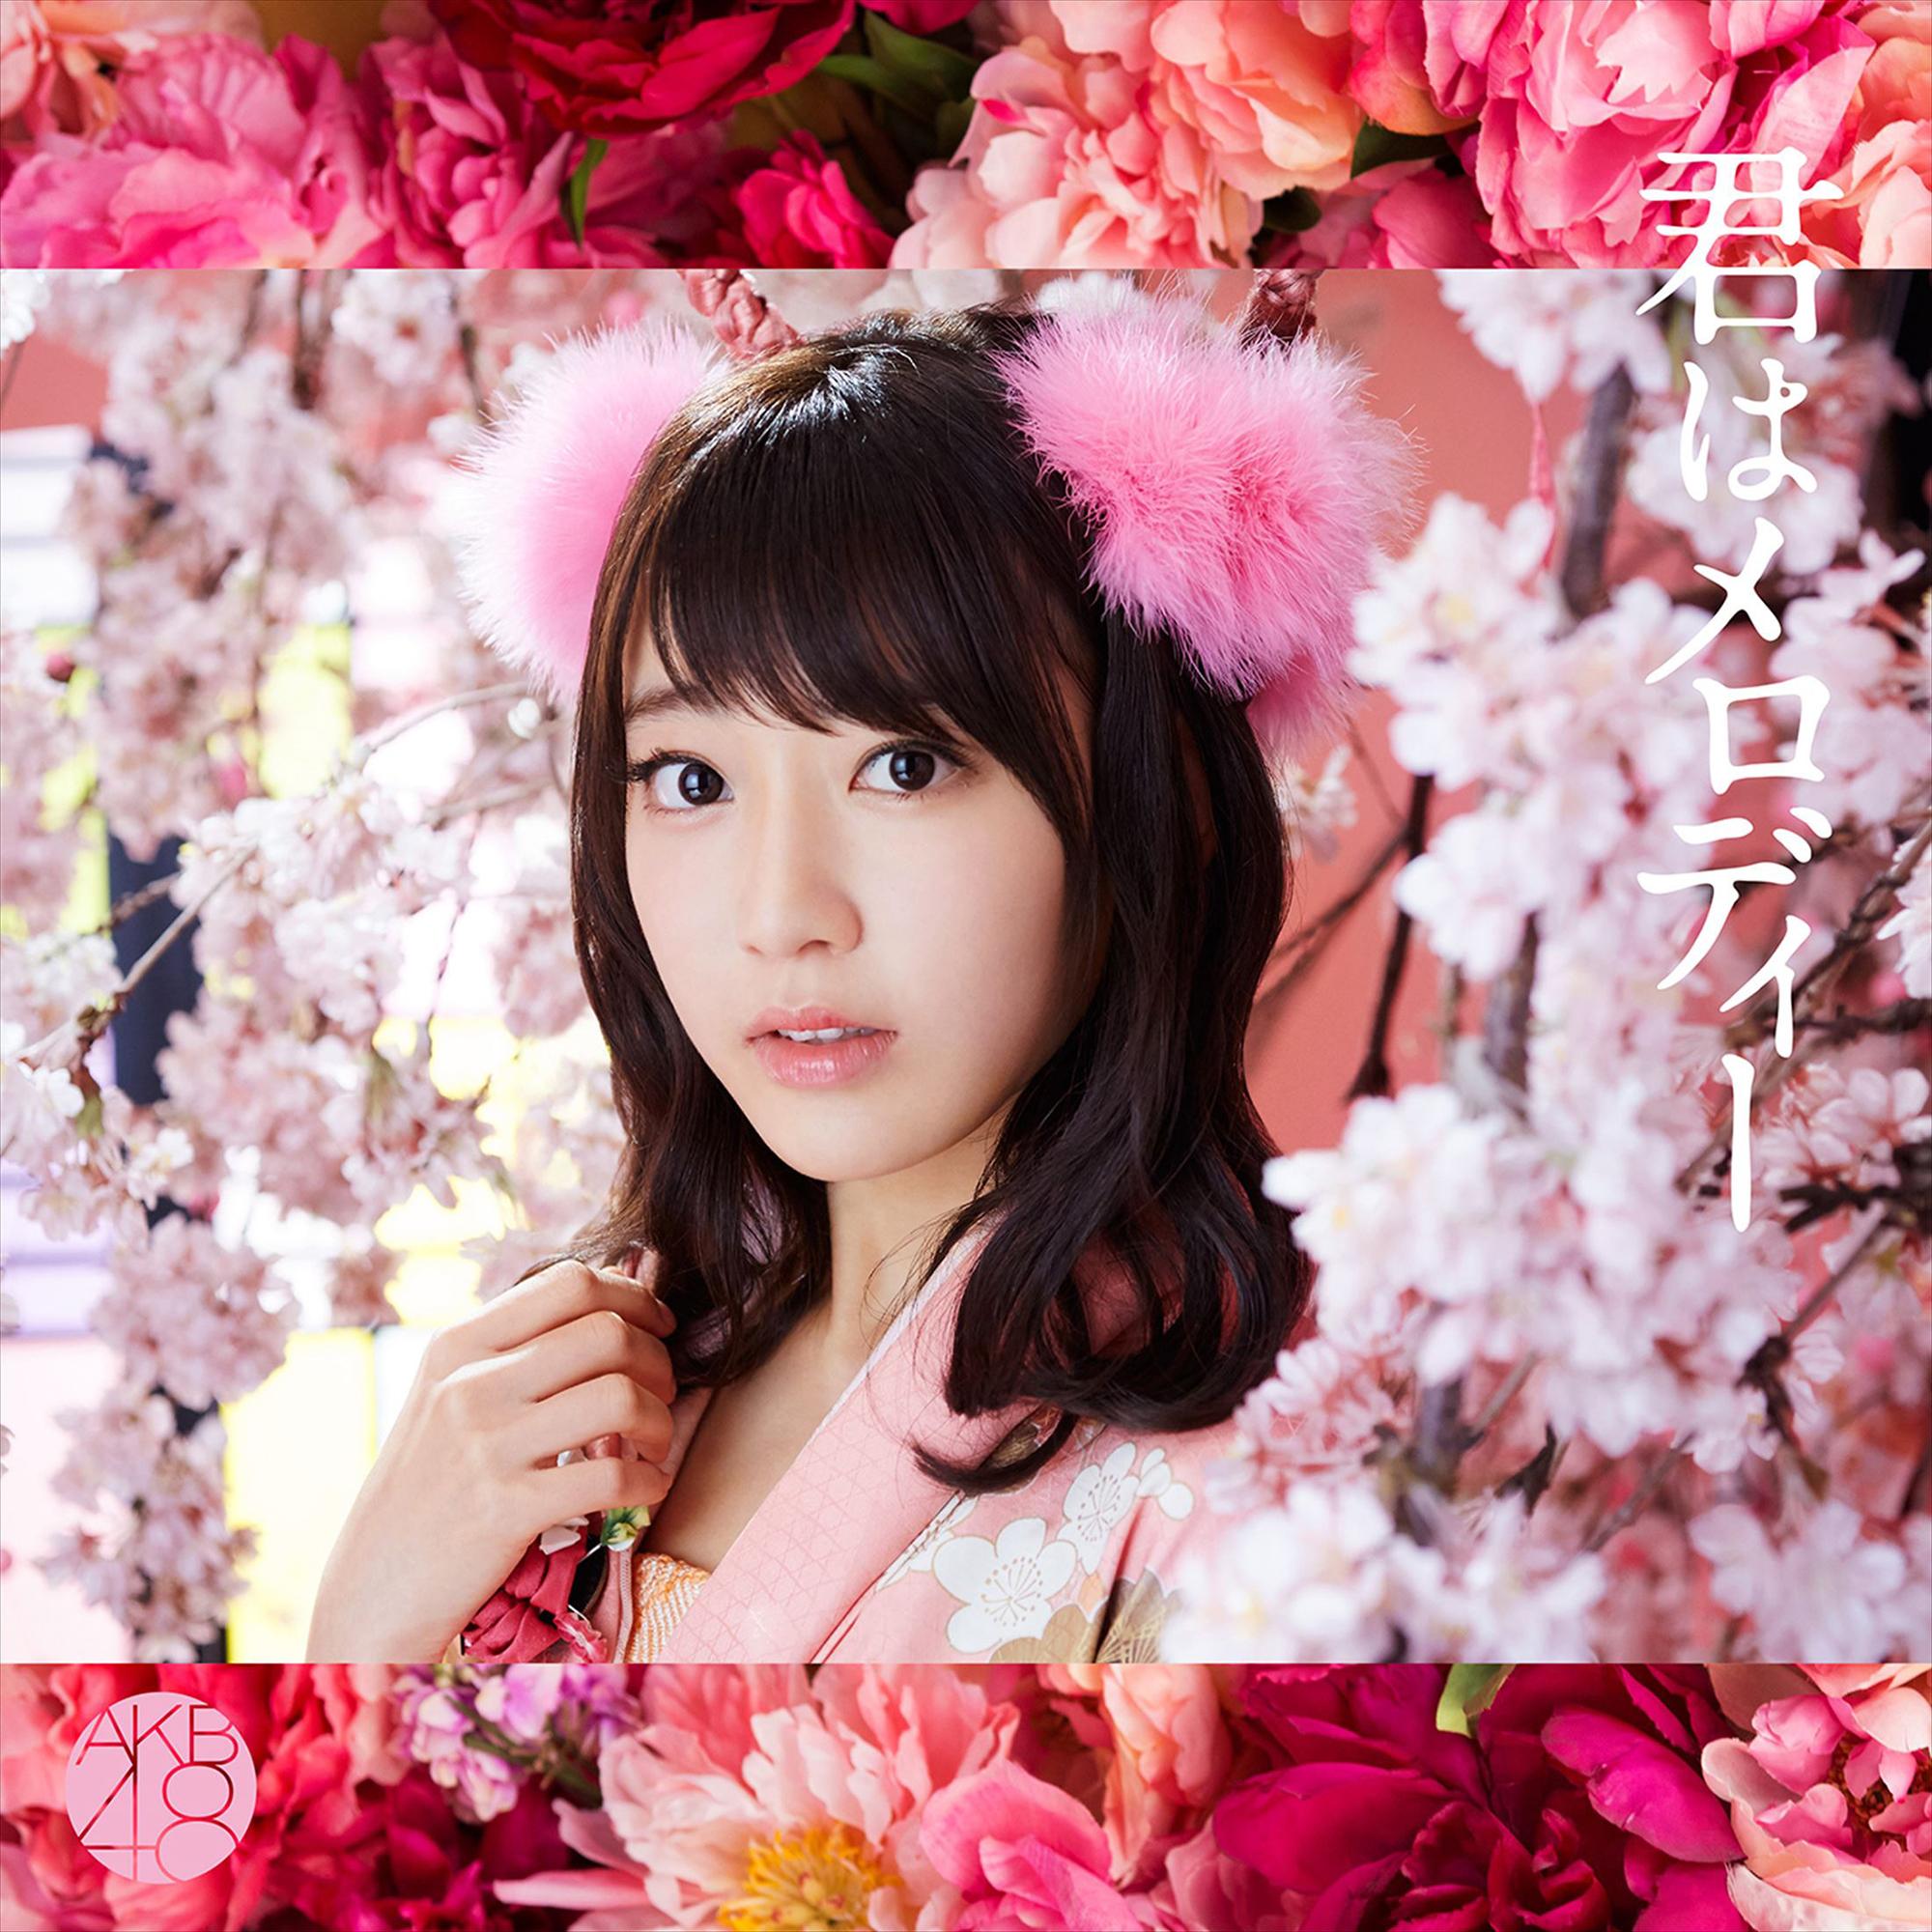 Art Work Japan: AKB48 - 君はメロディー